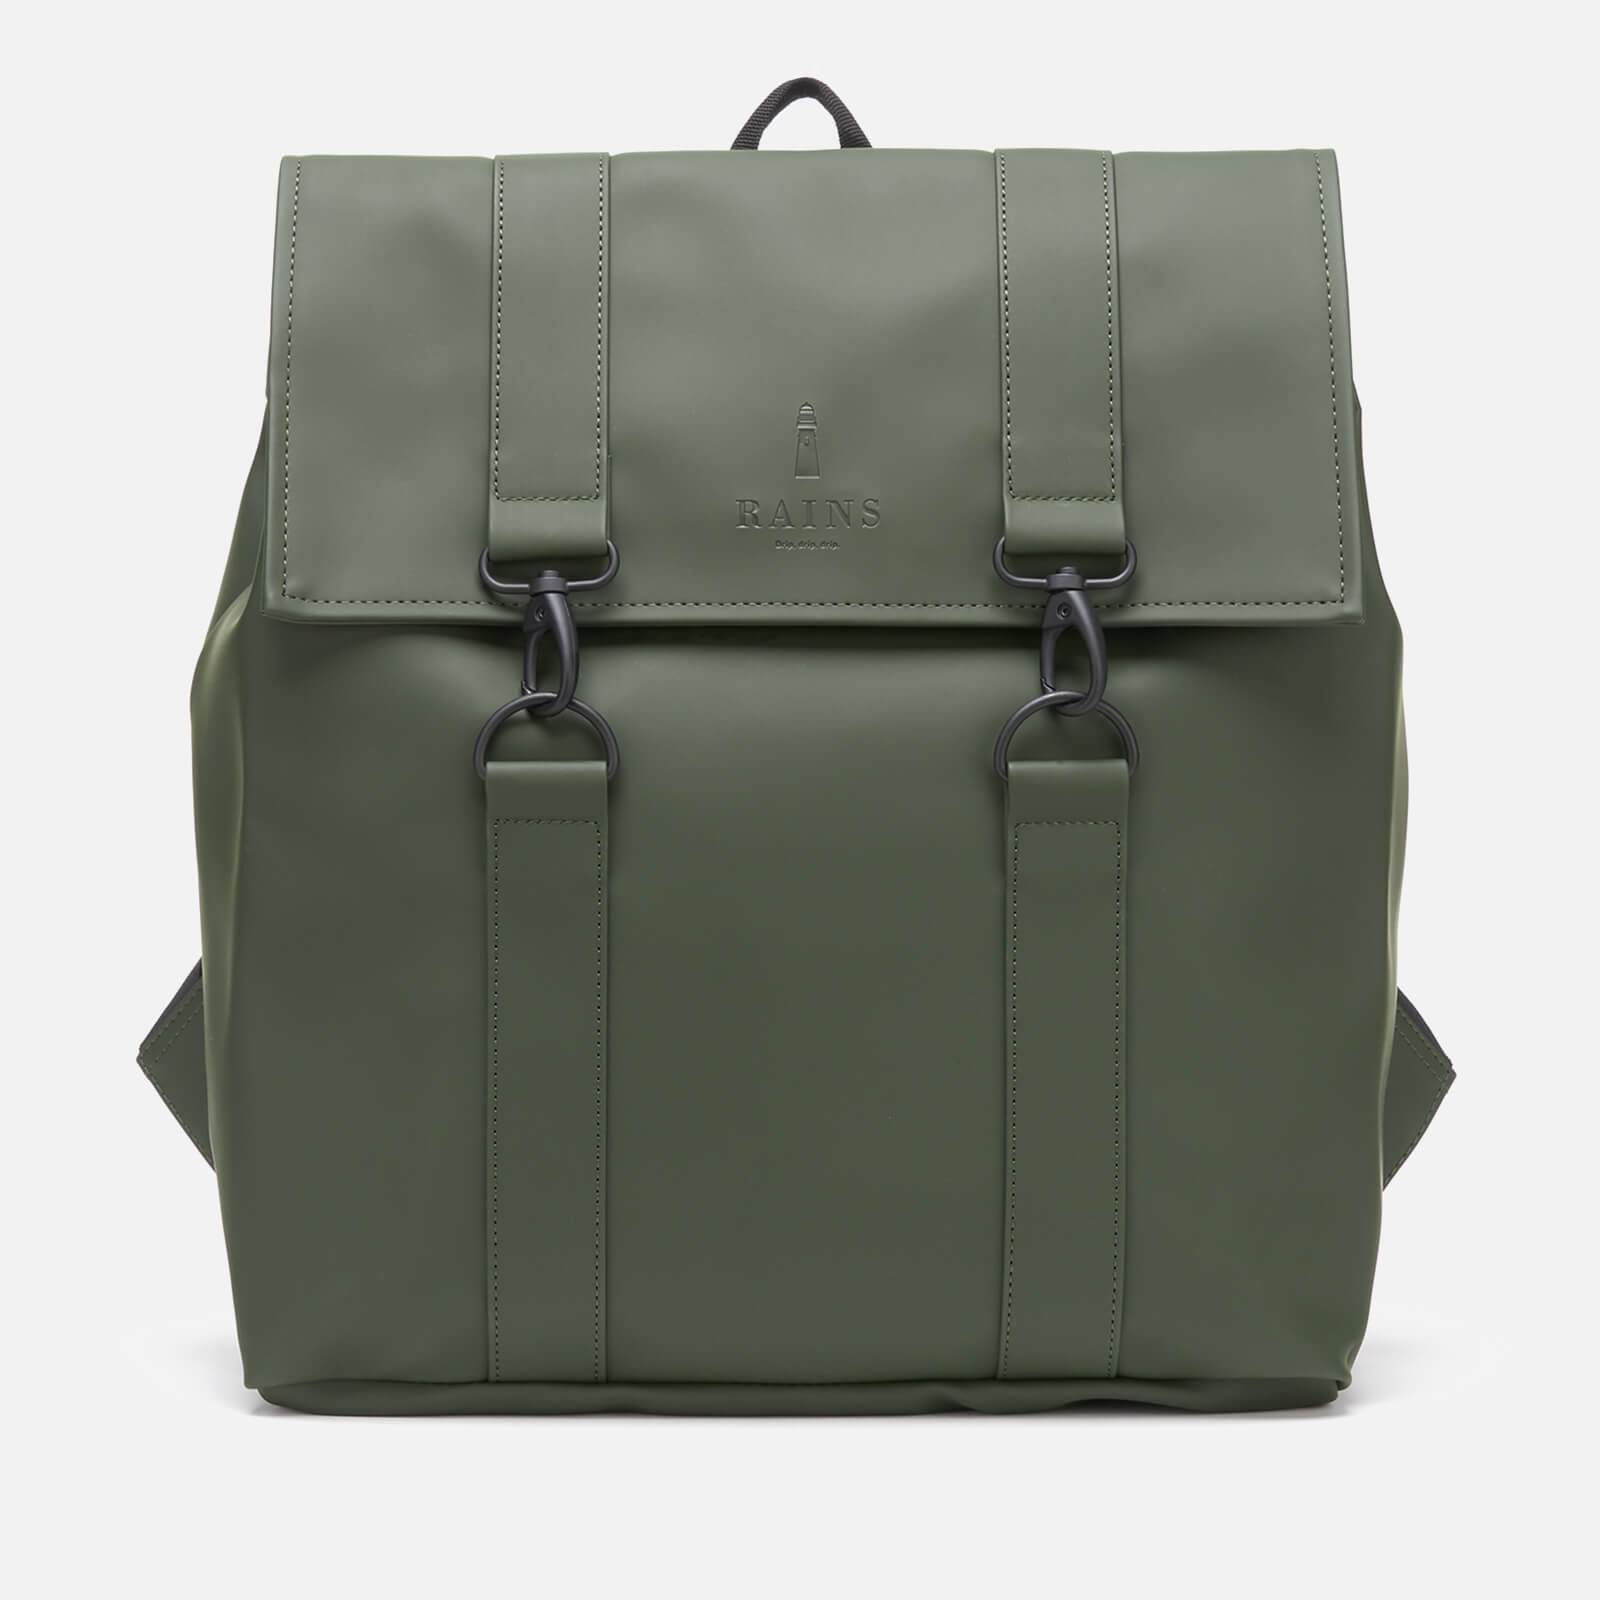 RAINS Men's MSN Bag - Green